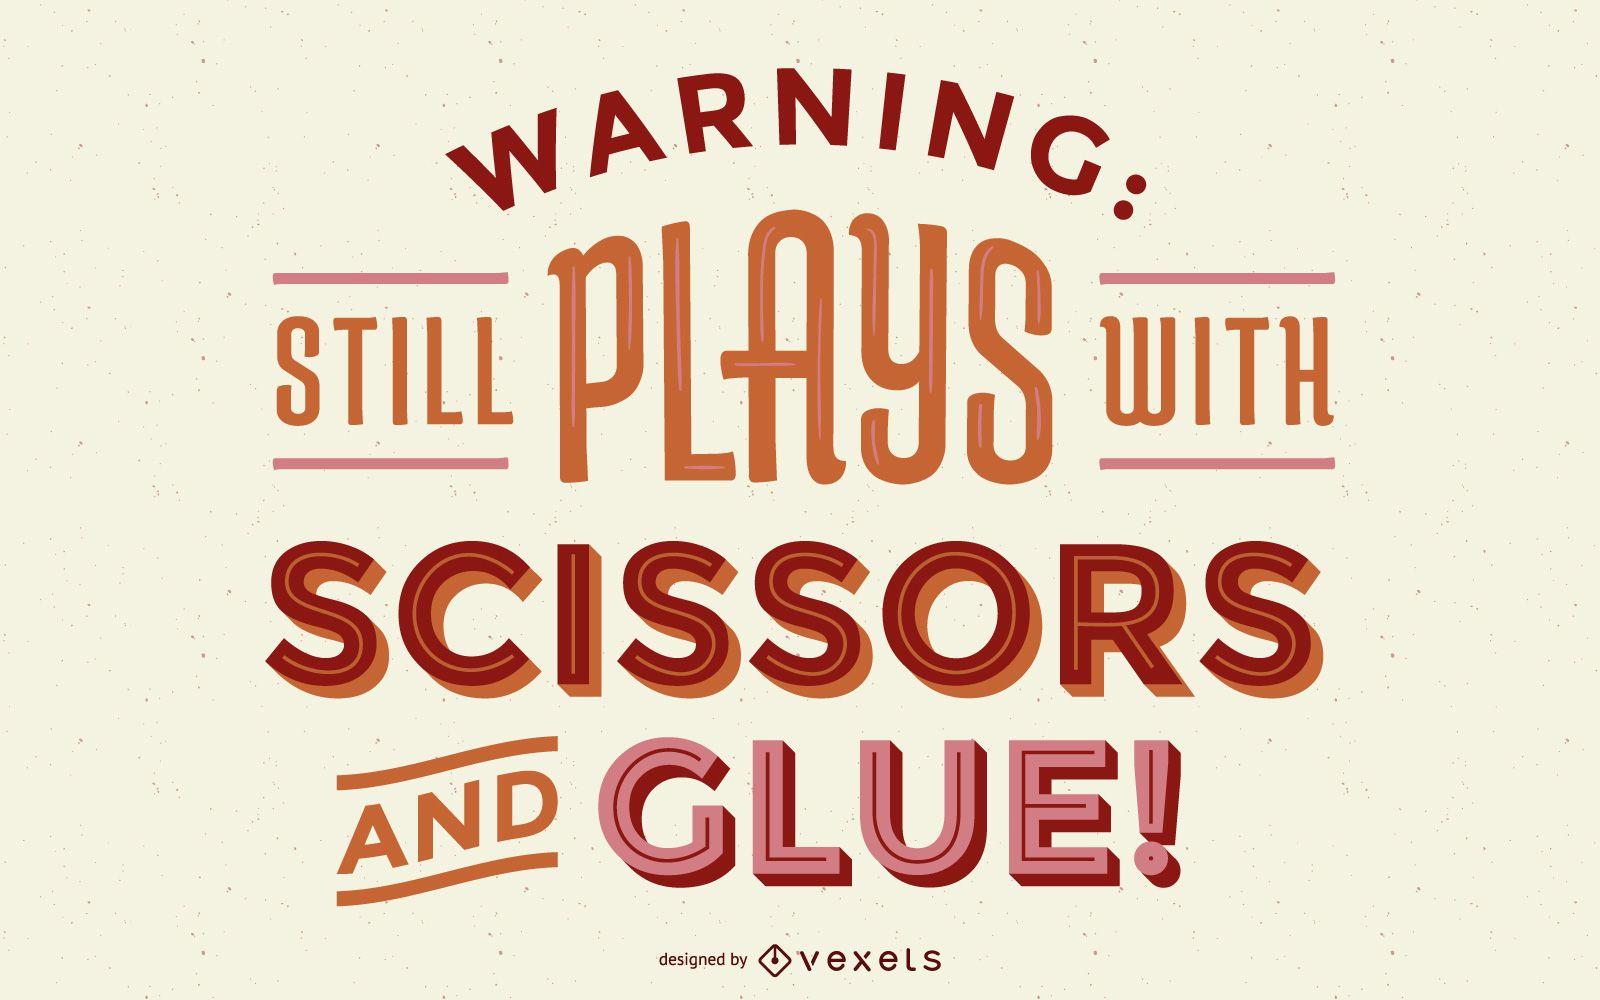 Warning crafting lettering design